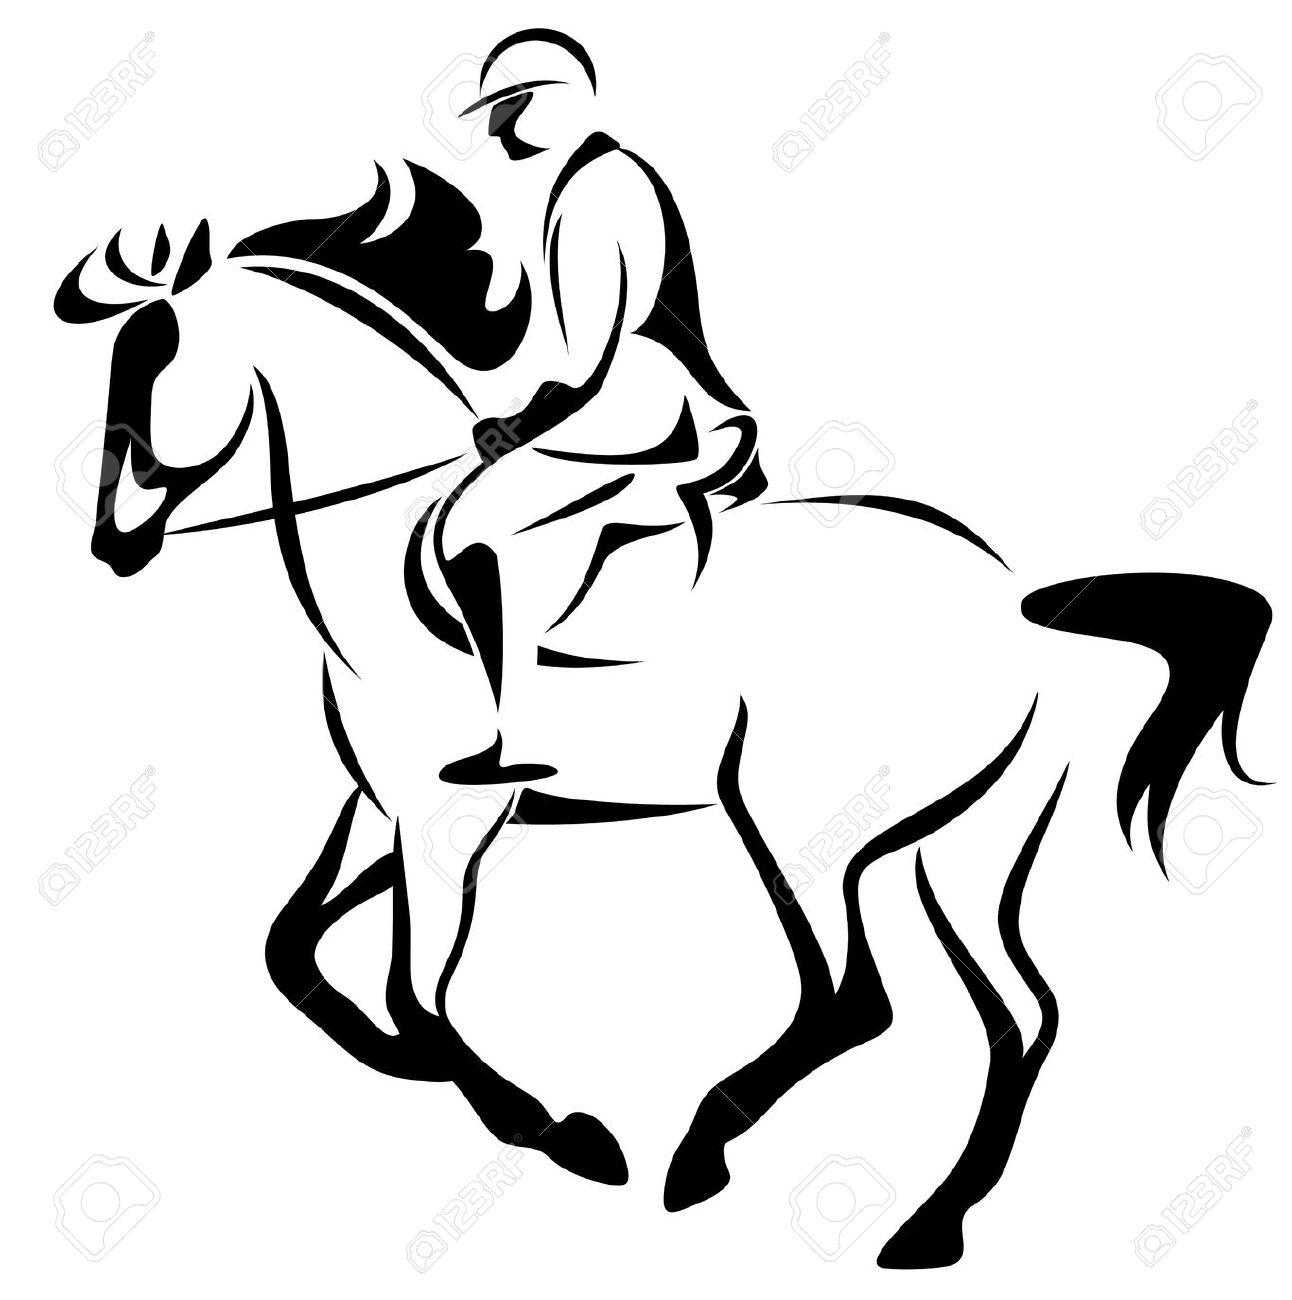 silhouette horse riding at getdrawings com free for personal use rh getdrawings com horse racing clip art horseback riding clipart